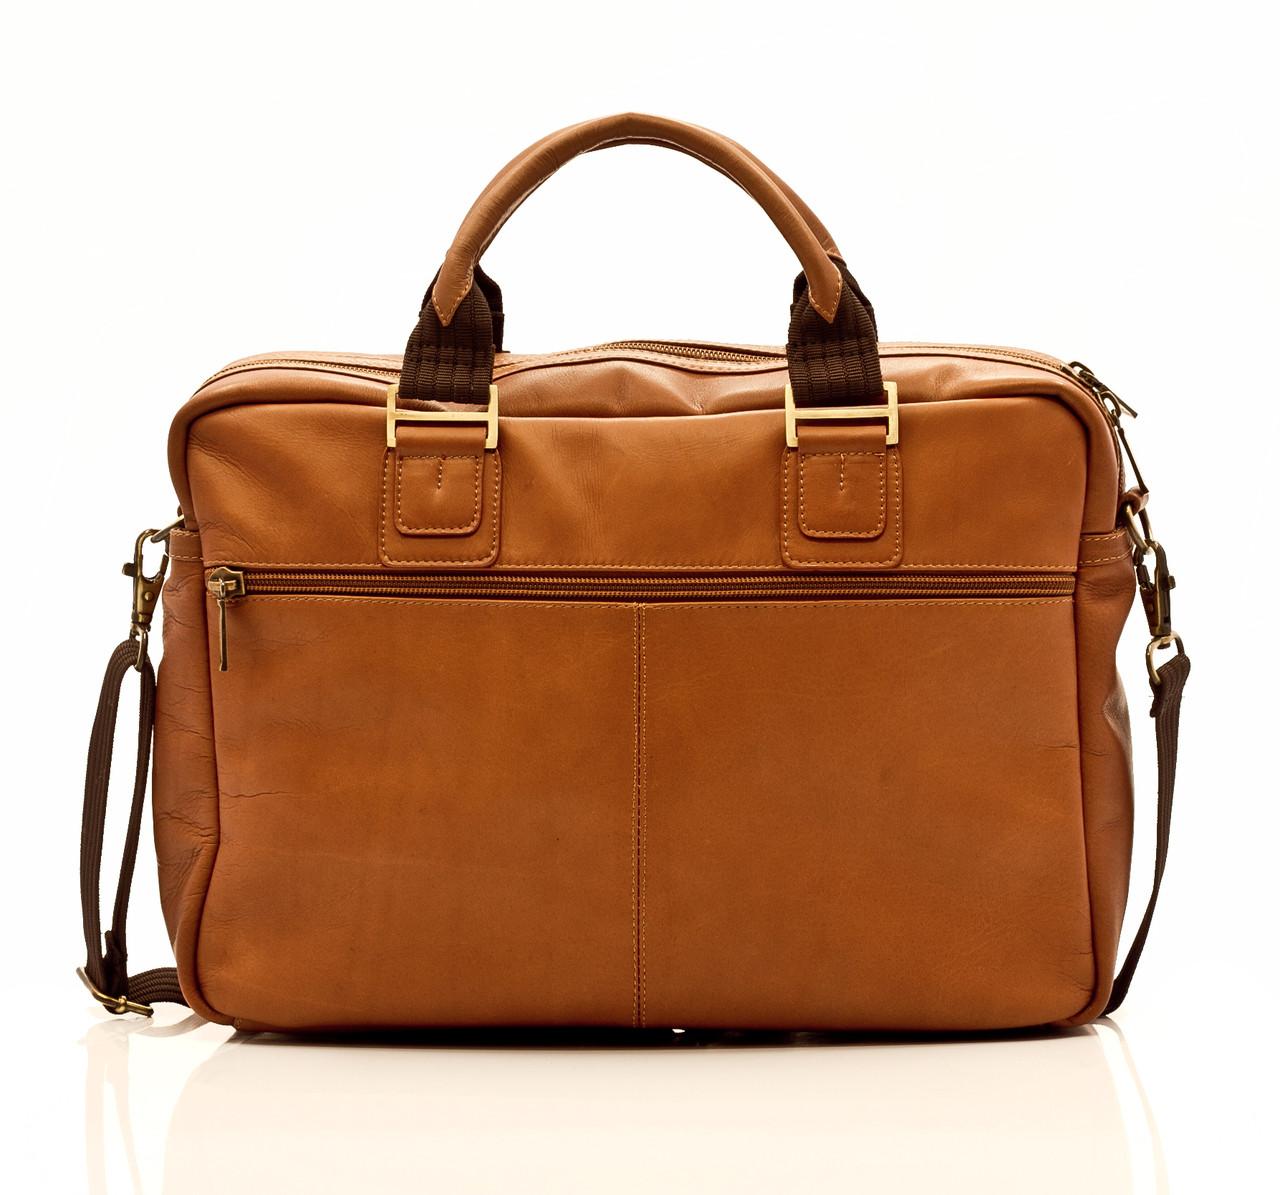 Muiska - Cairo - 15.6in Computer Bag - zippered pocket on back